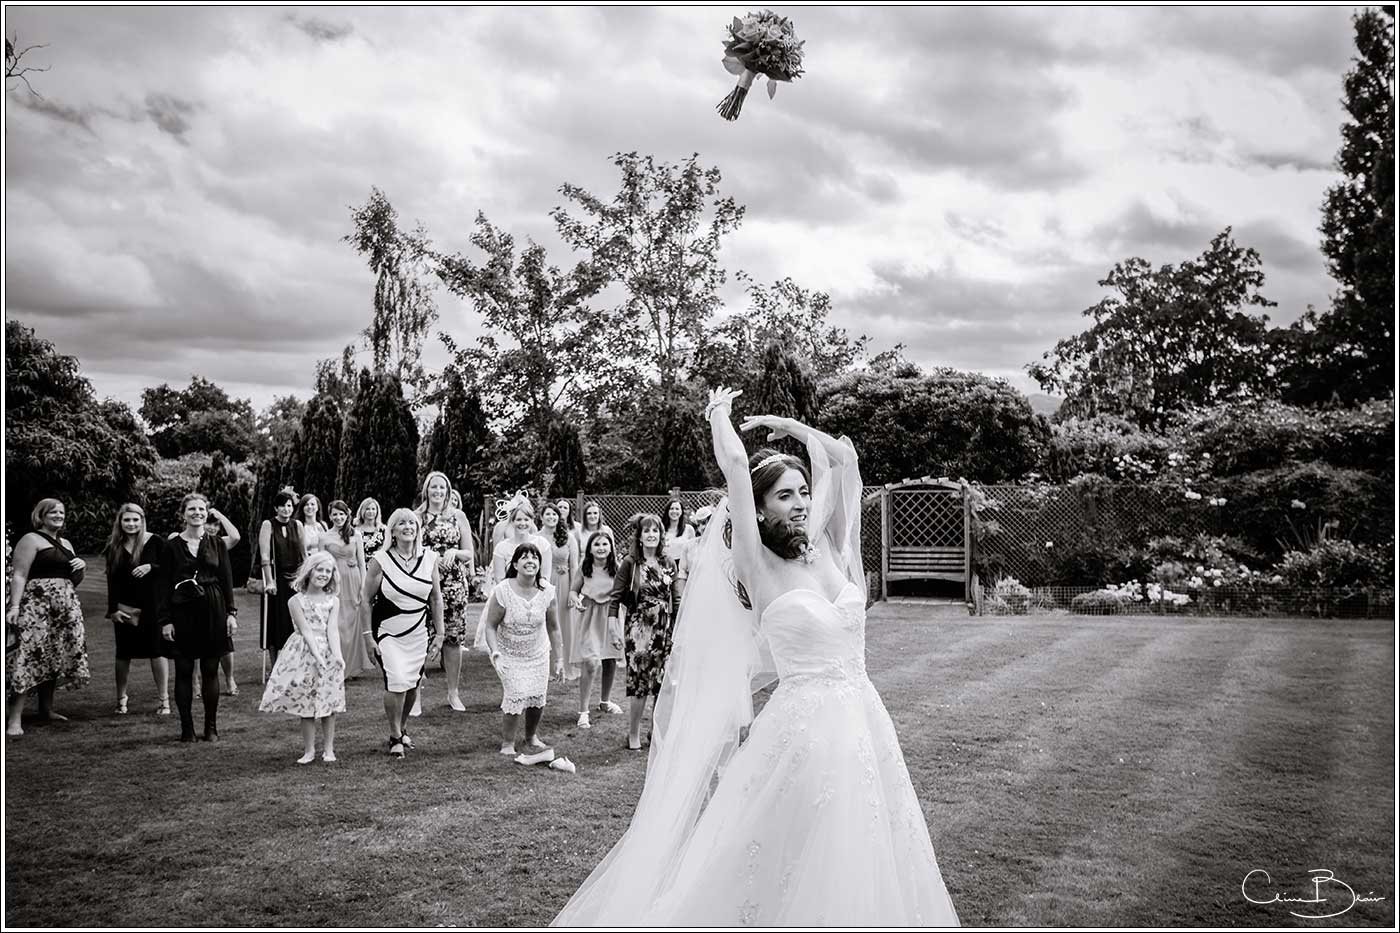 Bride throwing her bouquet: Bank House Wedding Photographer Clive Blair Photography. Documentary Birmingham Wedding Photographer